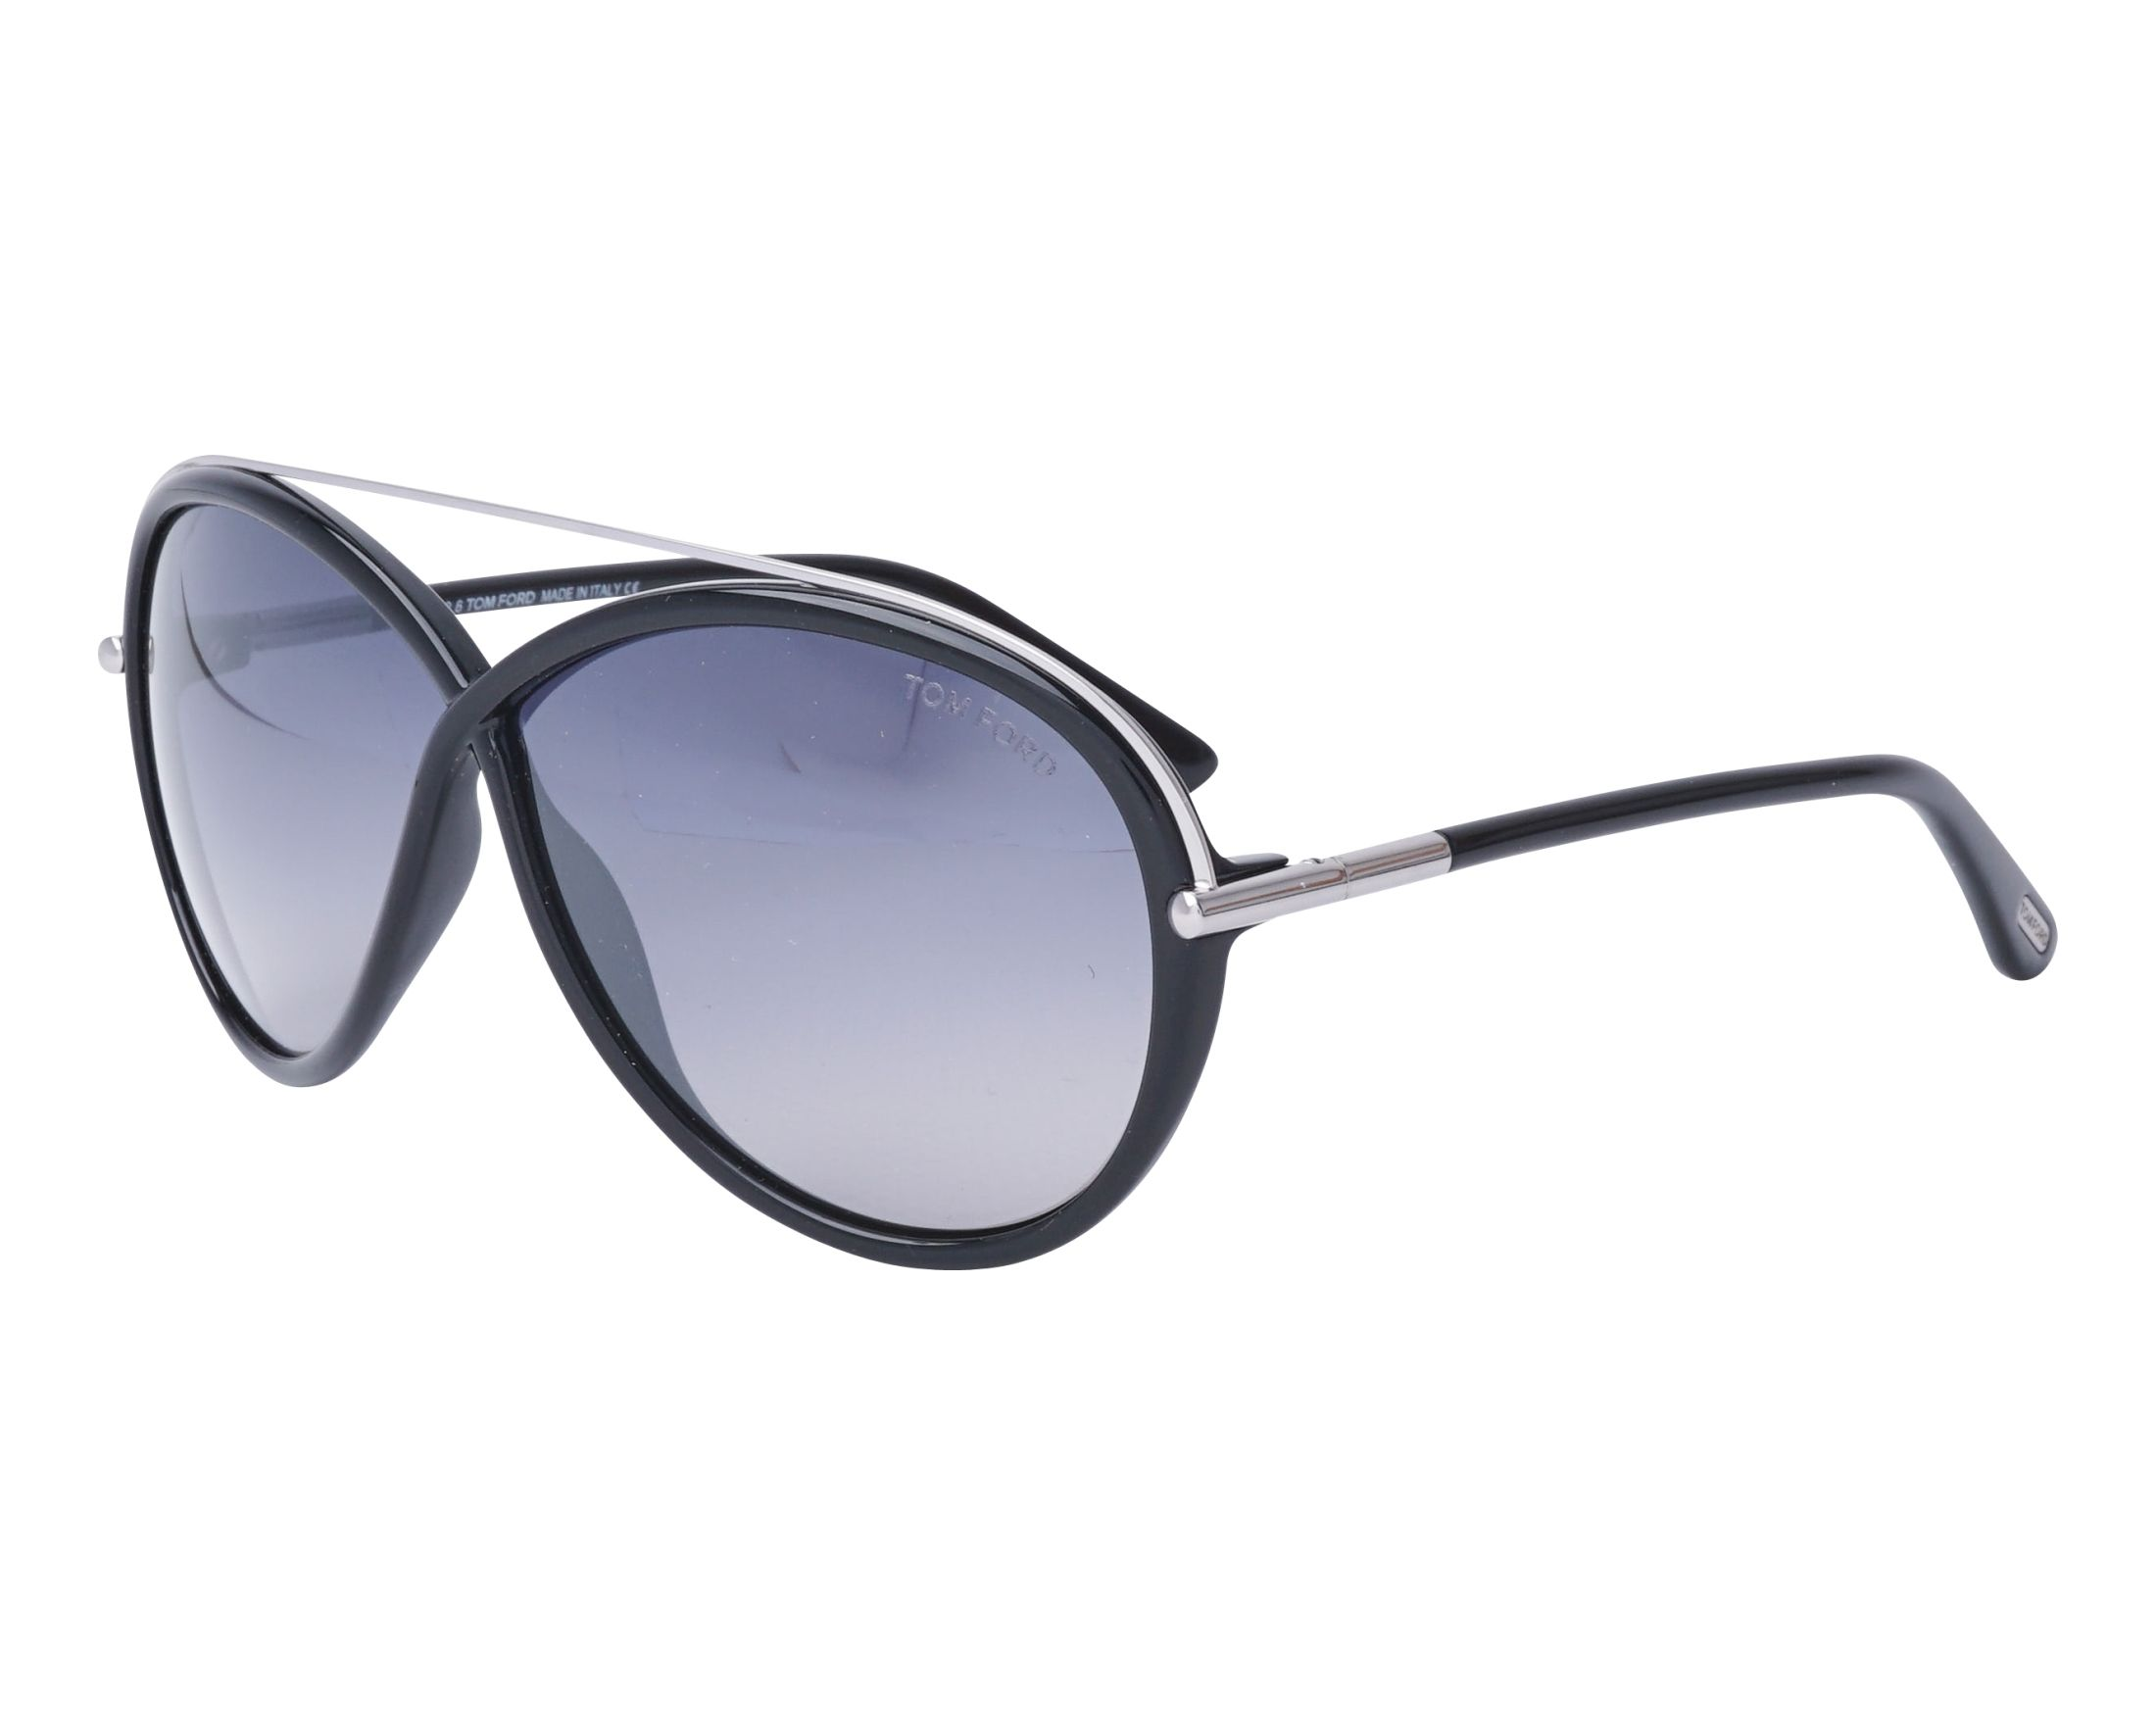 ford square frames brigade eyewear wayfarer optical louisiana normal bucket product acetate black tom eyeglasses glasses